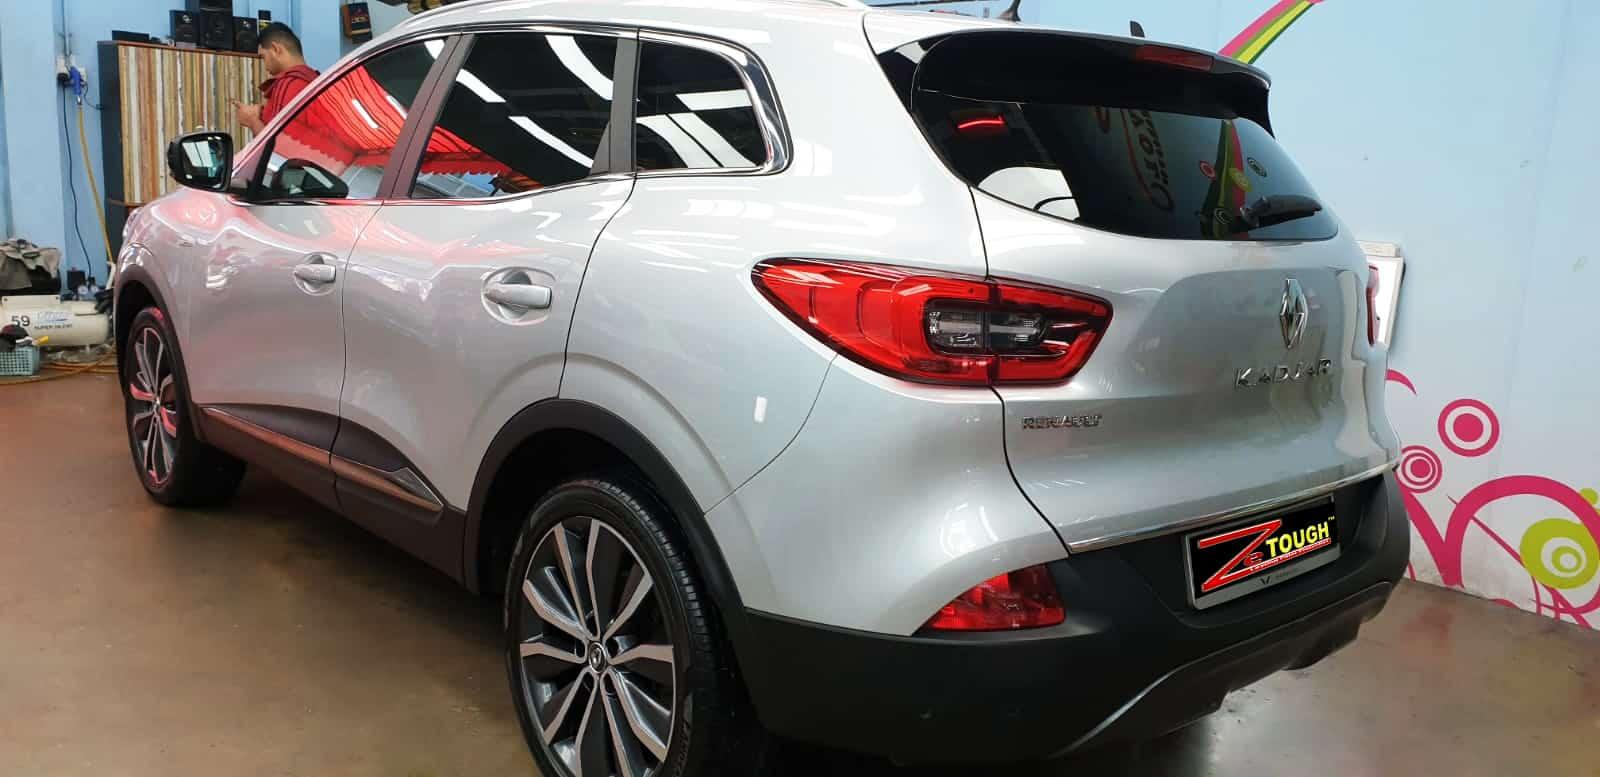 Stunning Renault Kadjar - rear